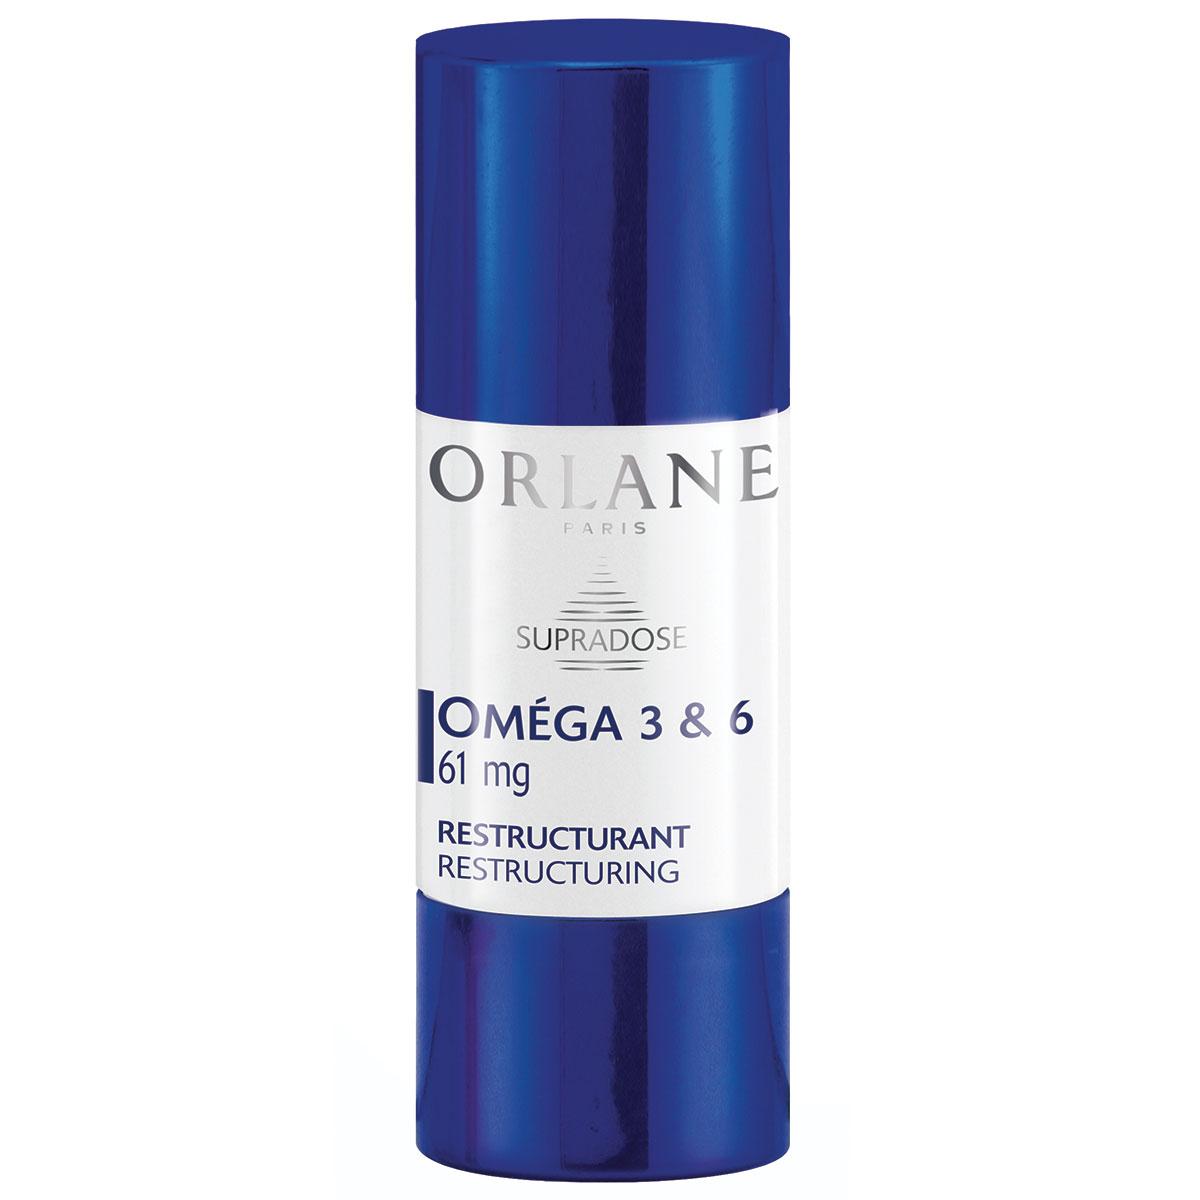 Orlane - Supradose - Concentré Oméga 3 & 6 Restructurant 15 ml